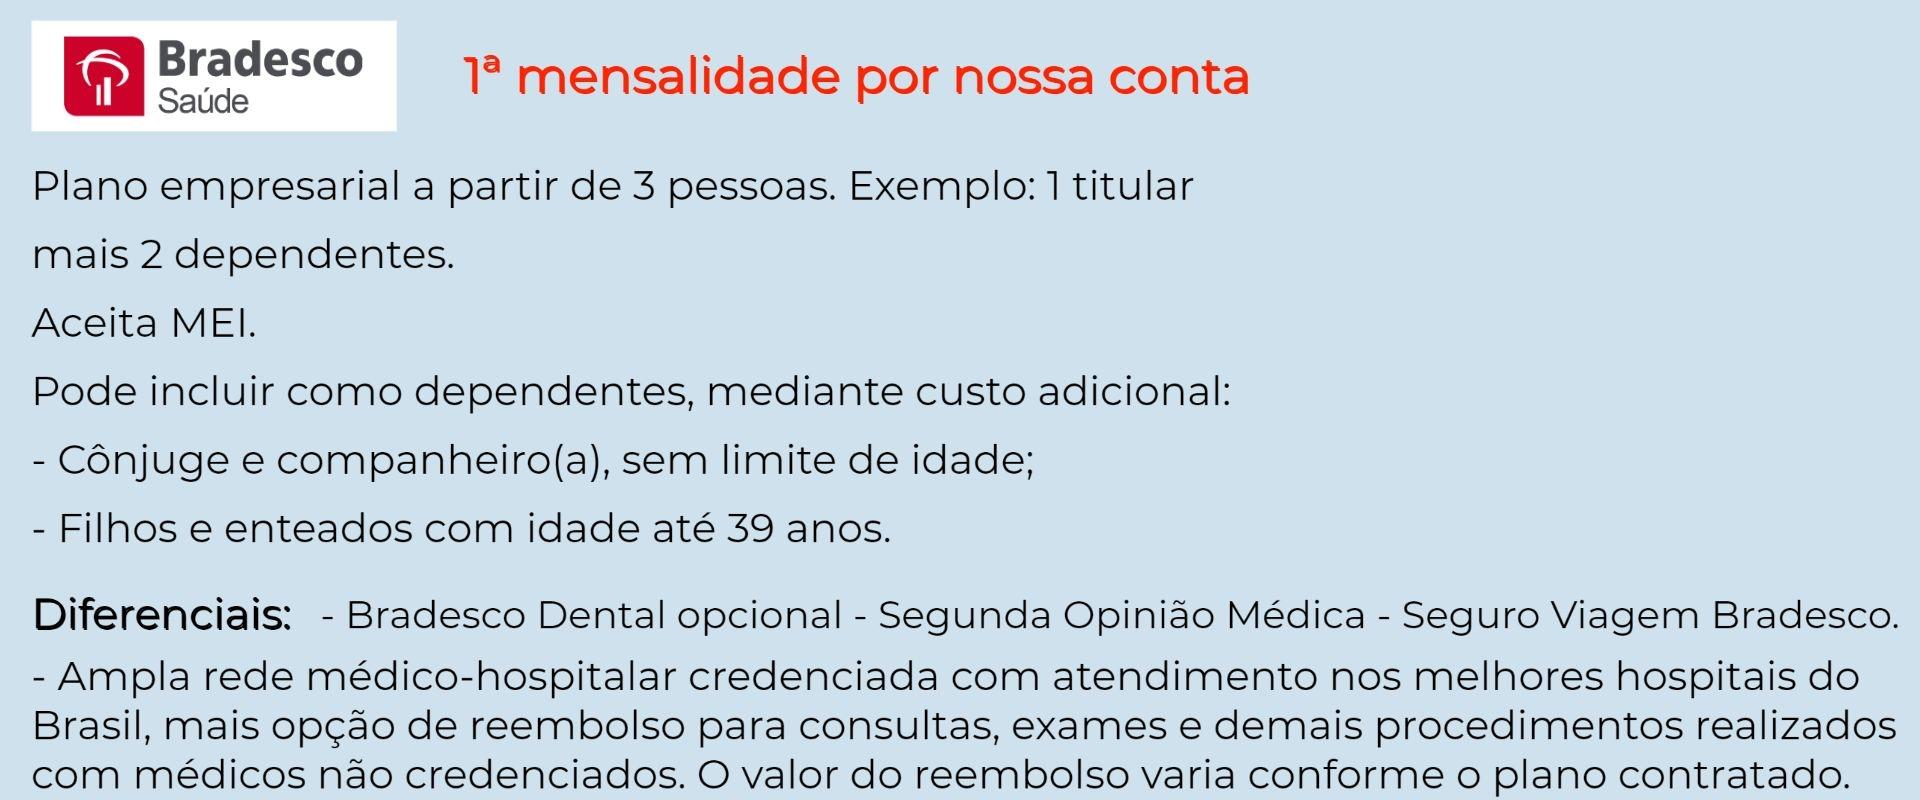 Bradesco Saúde Empresarial - Porto Ferreira